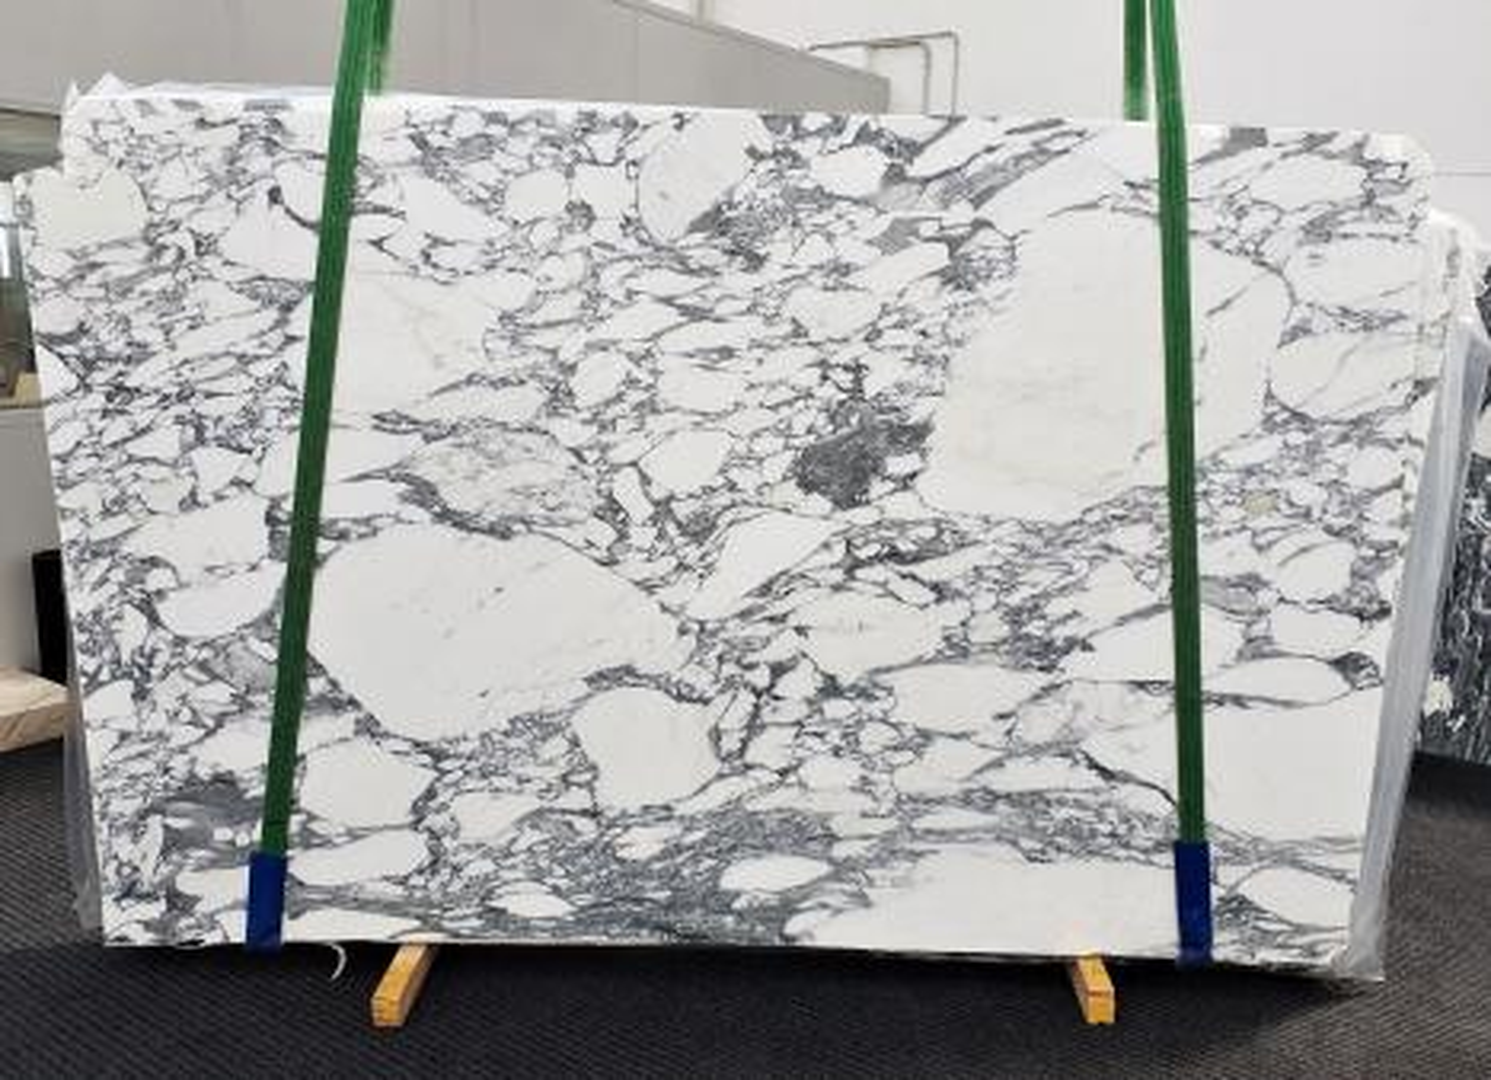 ARABESCATO CORCHIA polierte Unmaßplatten 1433 aus Natur Marmor , Slab #55: Lieferung Veneto, Italien